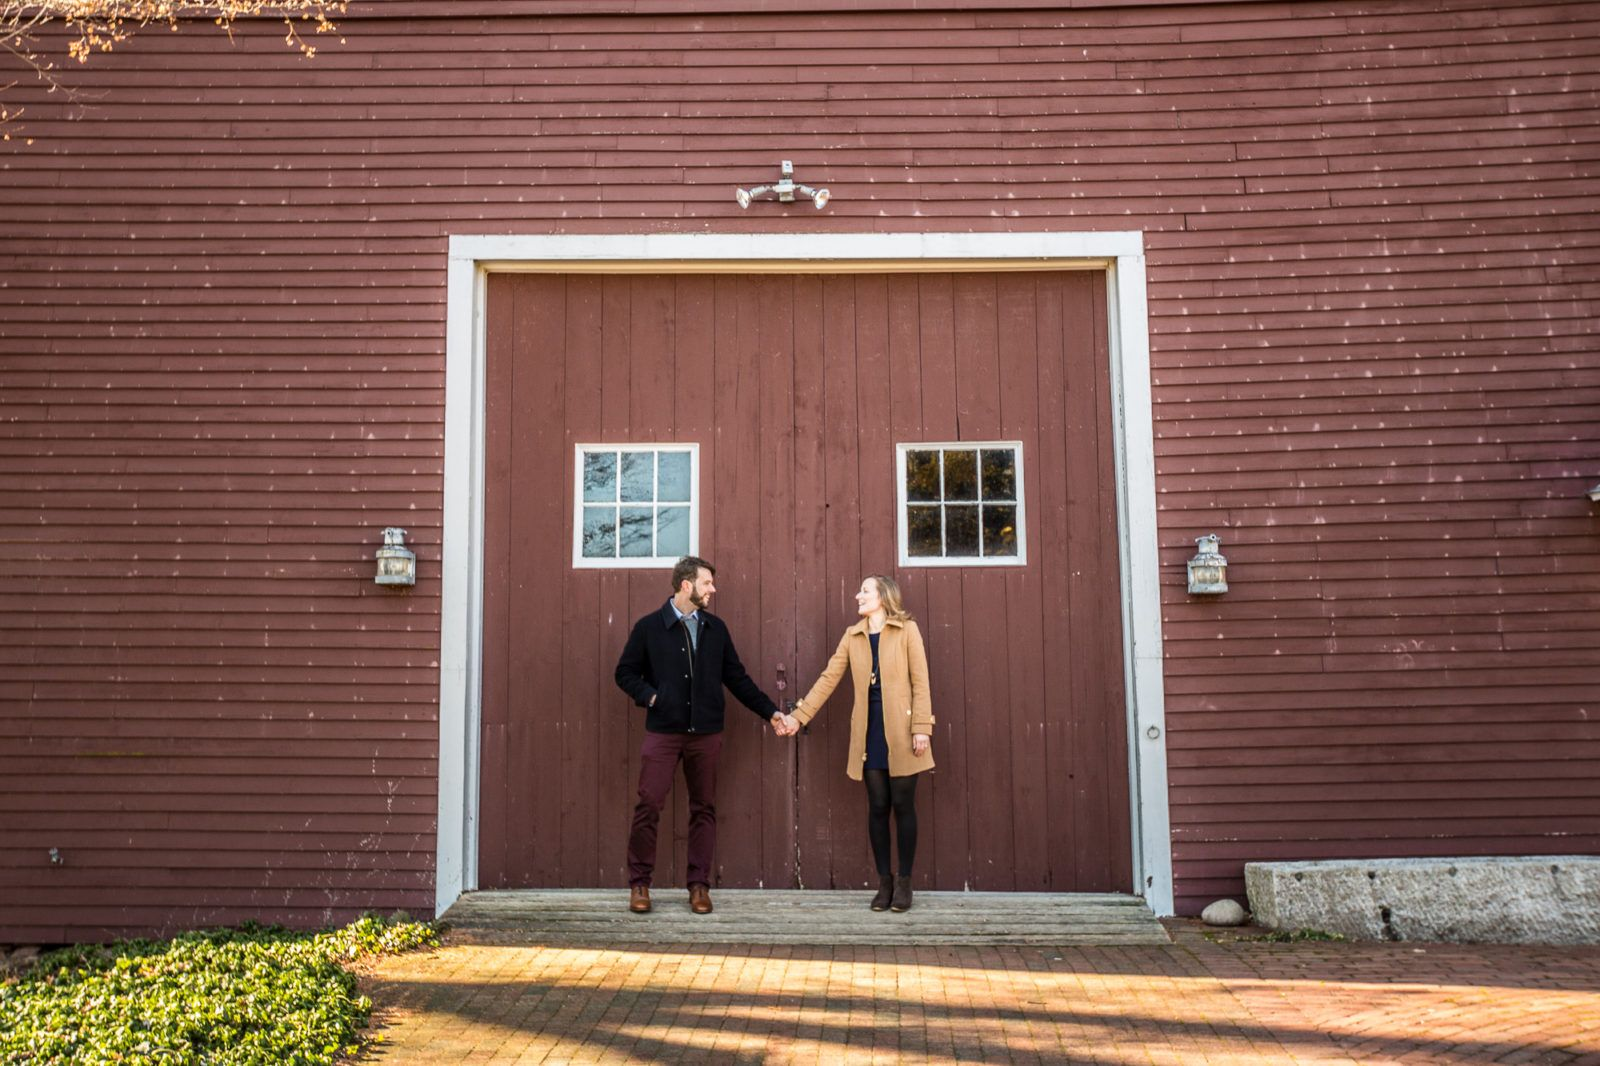 Barn Wedding Venues of Connecticut | Barn wedding venue ...